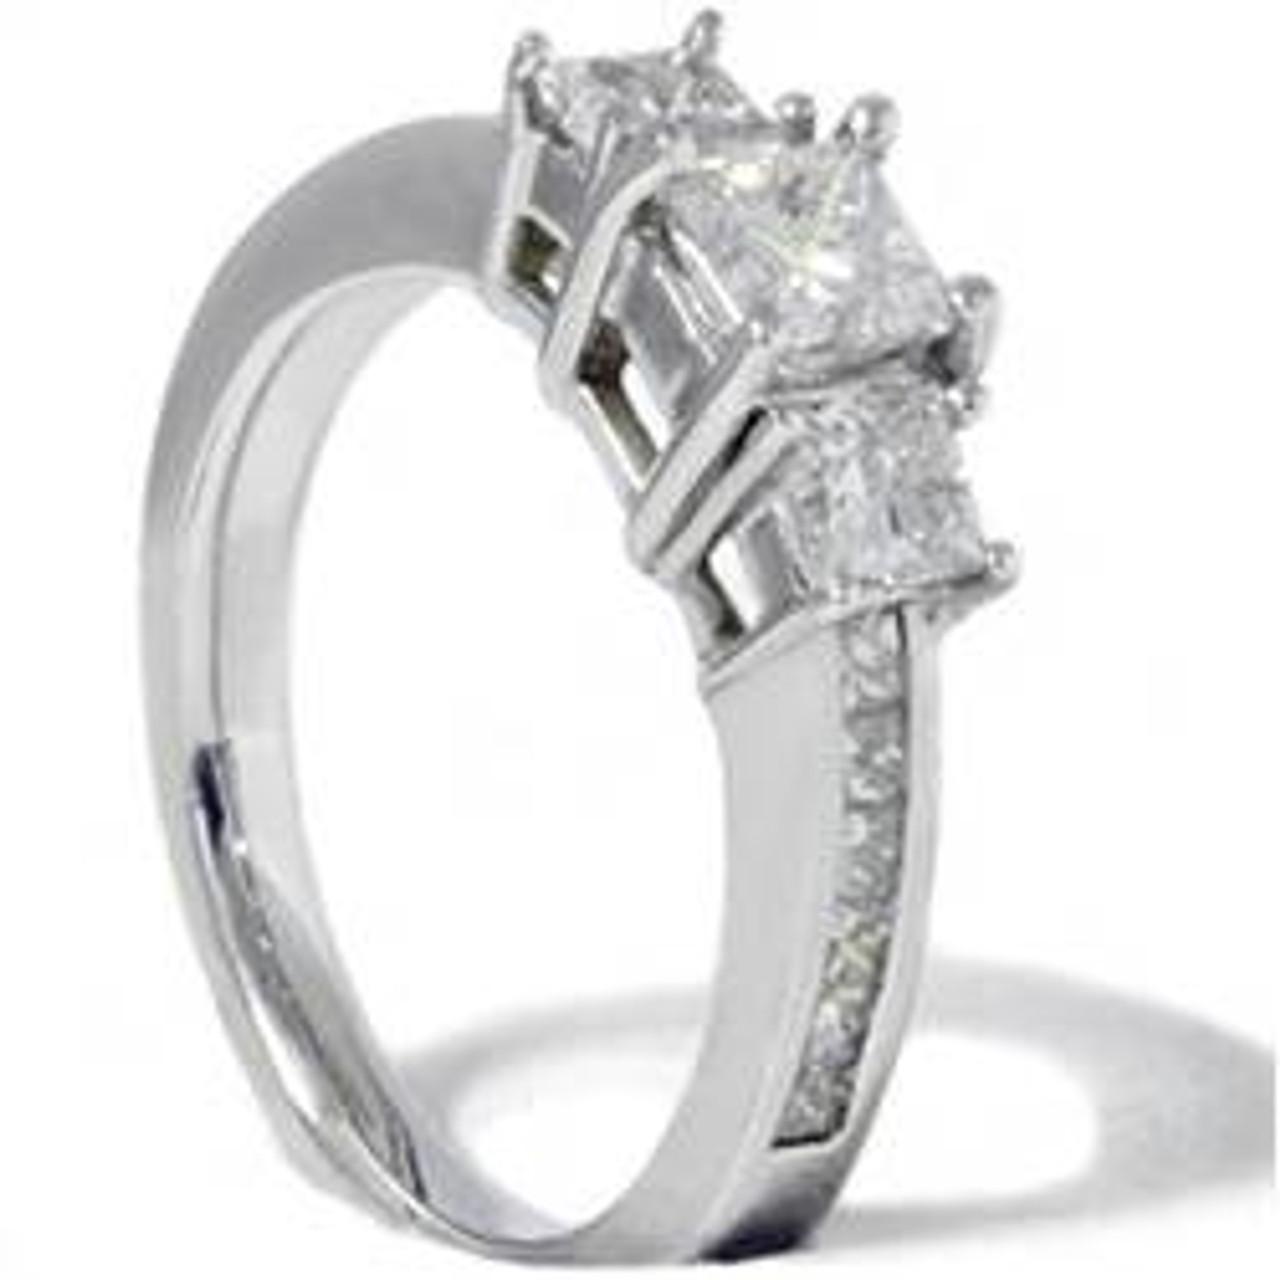 Princess Cut Diamond Engagement Ring 3 Stone 1 1 2ct 14k